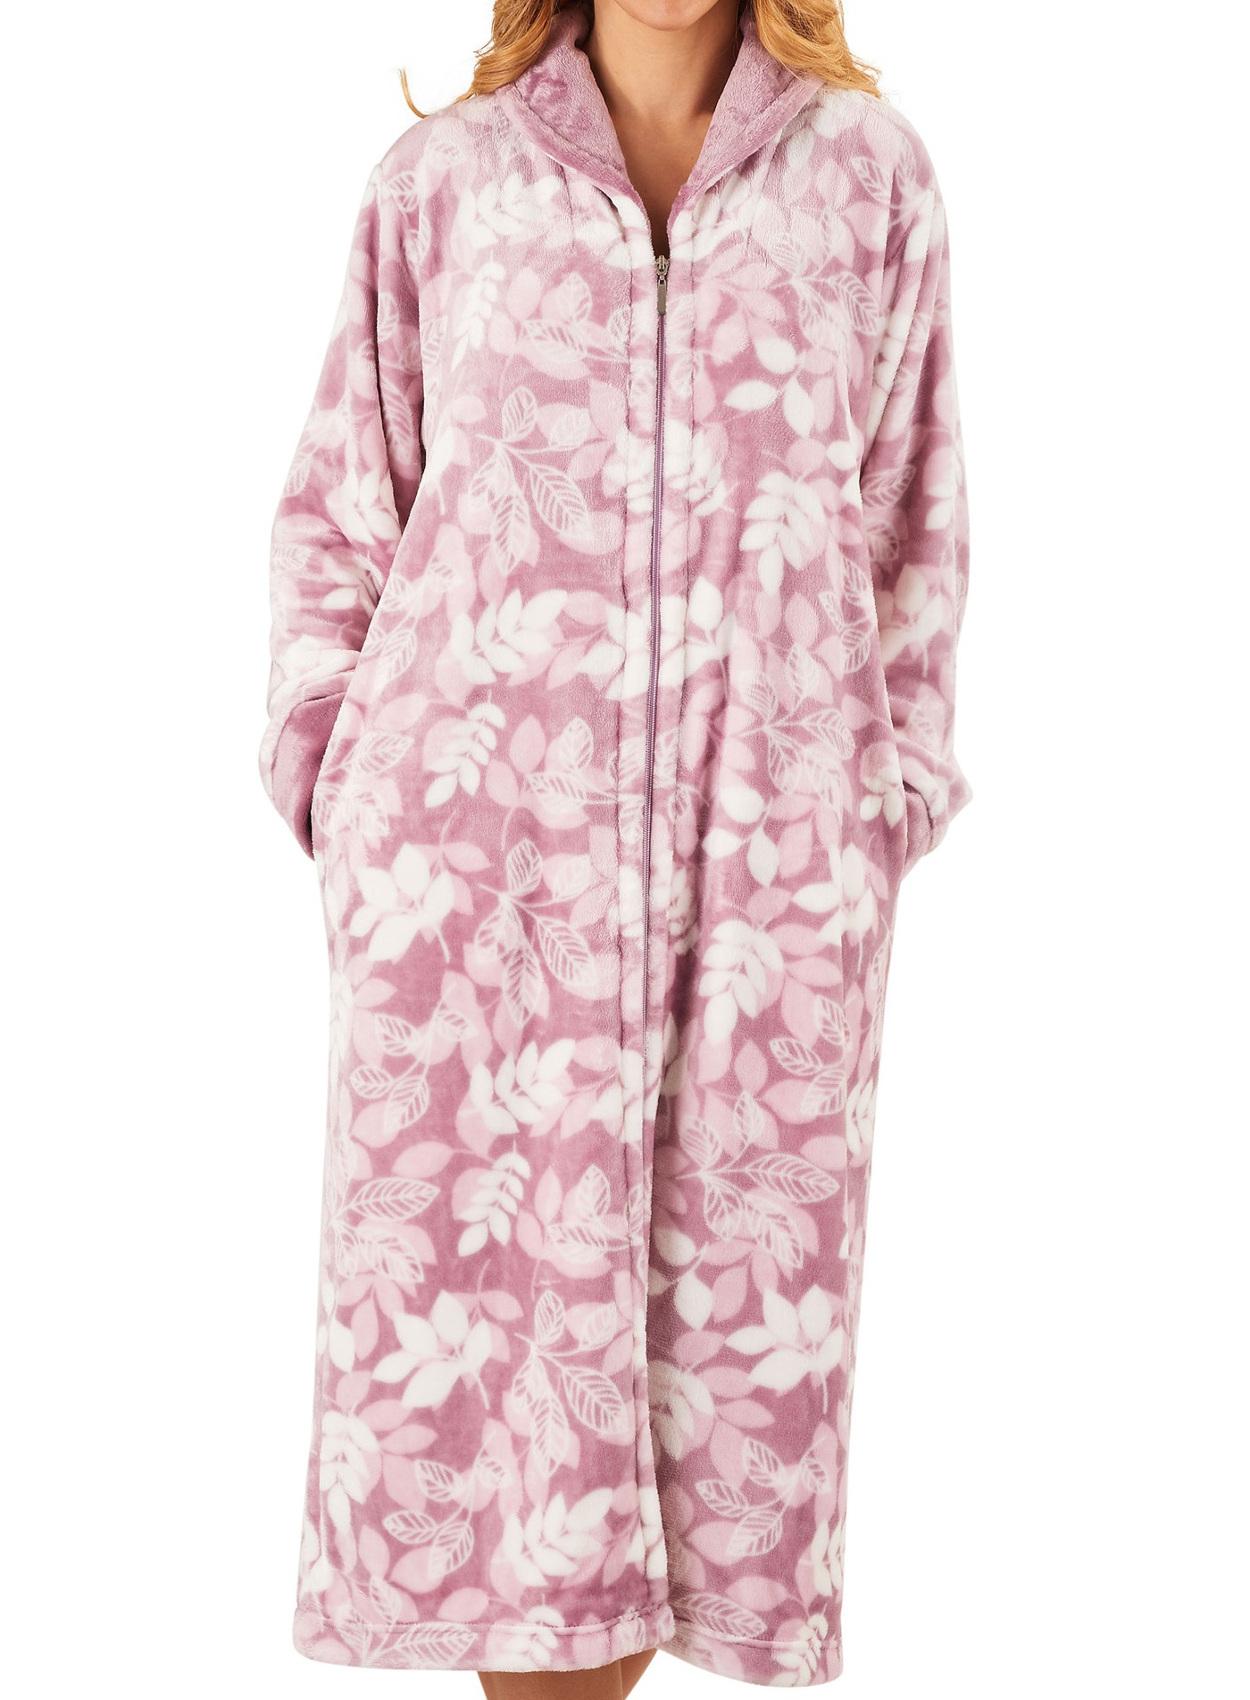 Slenderella Ladies Zip Up Dressing Gown Super Soft Leaf Print ...